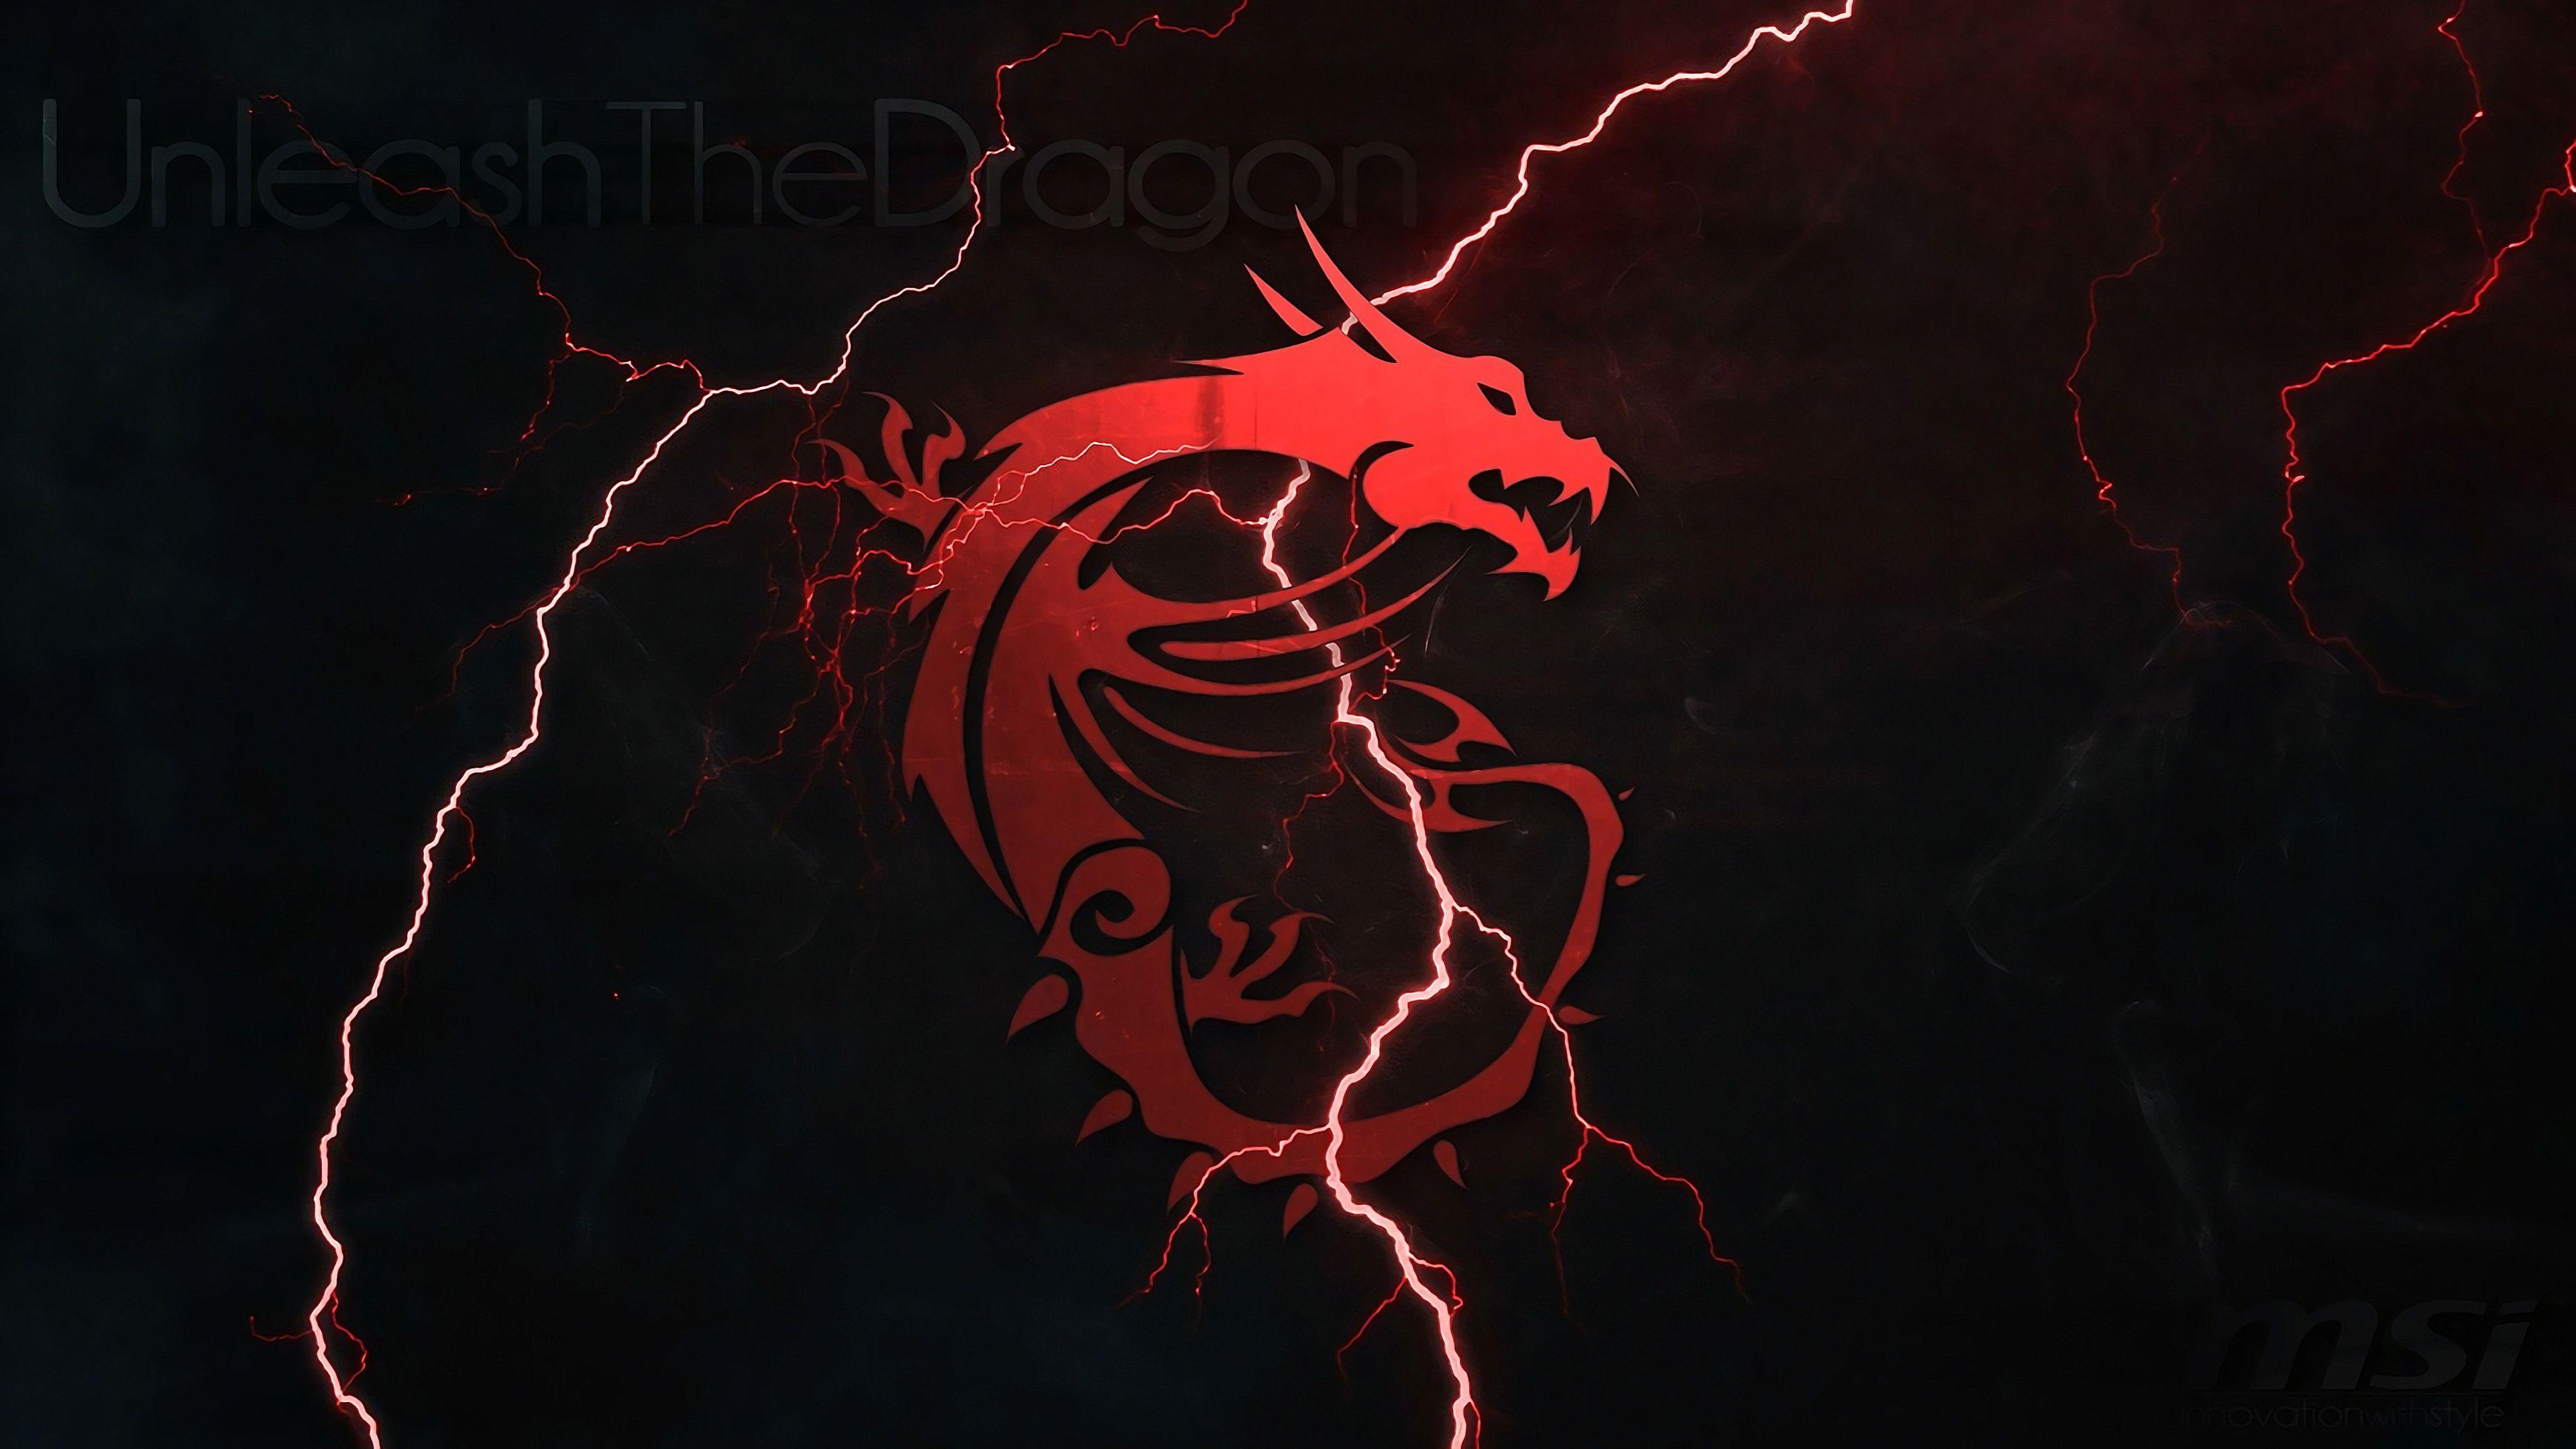 Msi Dragon Logo Lightning 4k Wallpaper In 2019 Dark